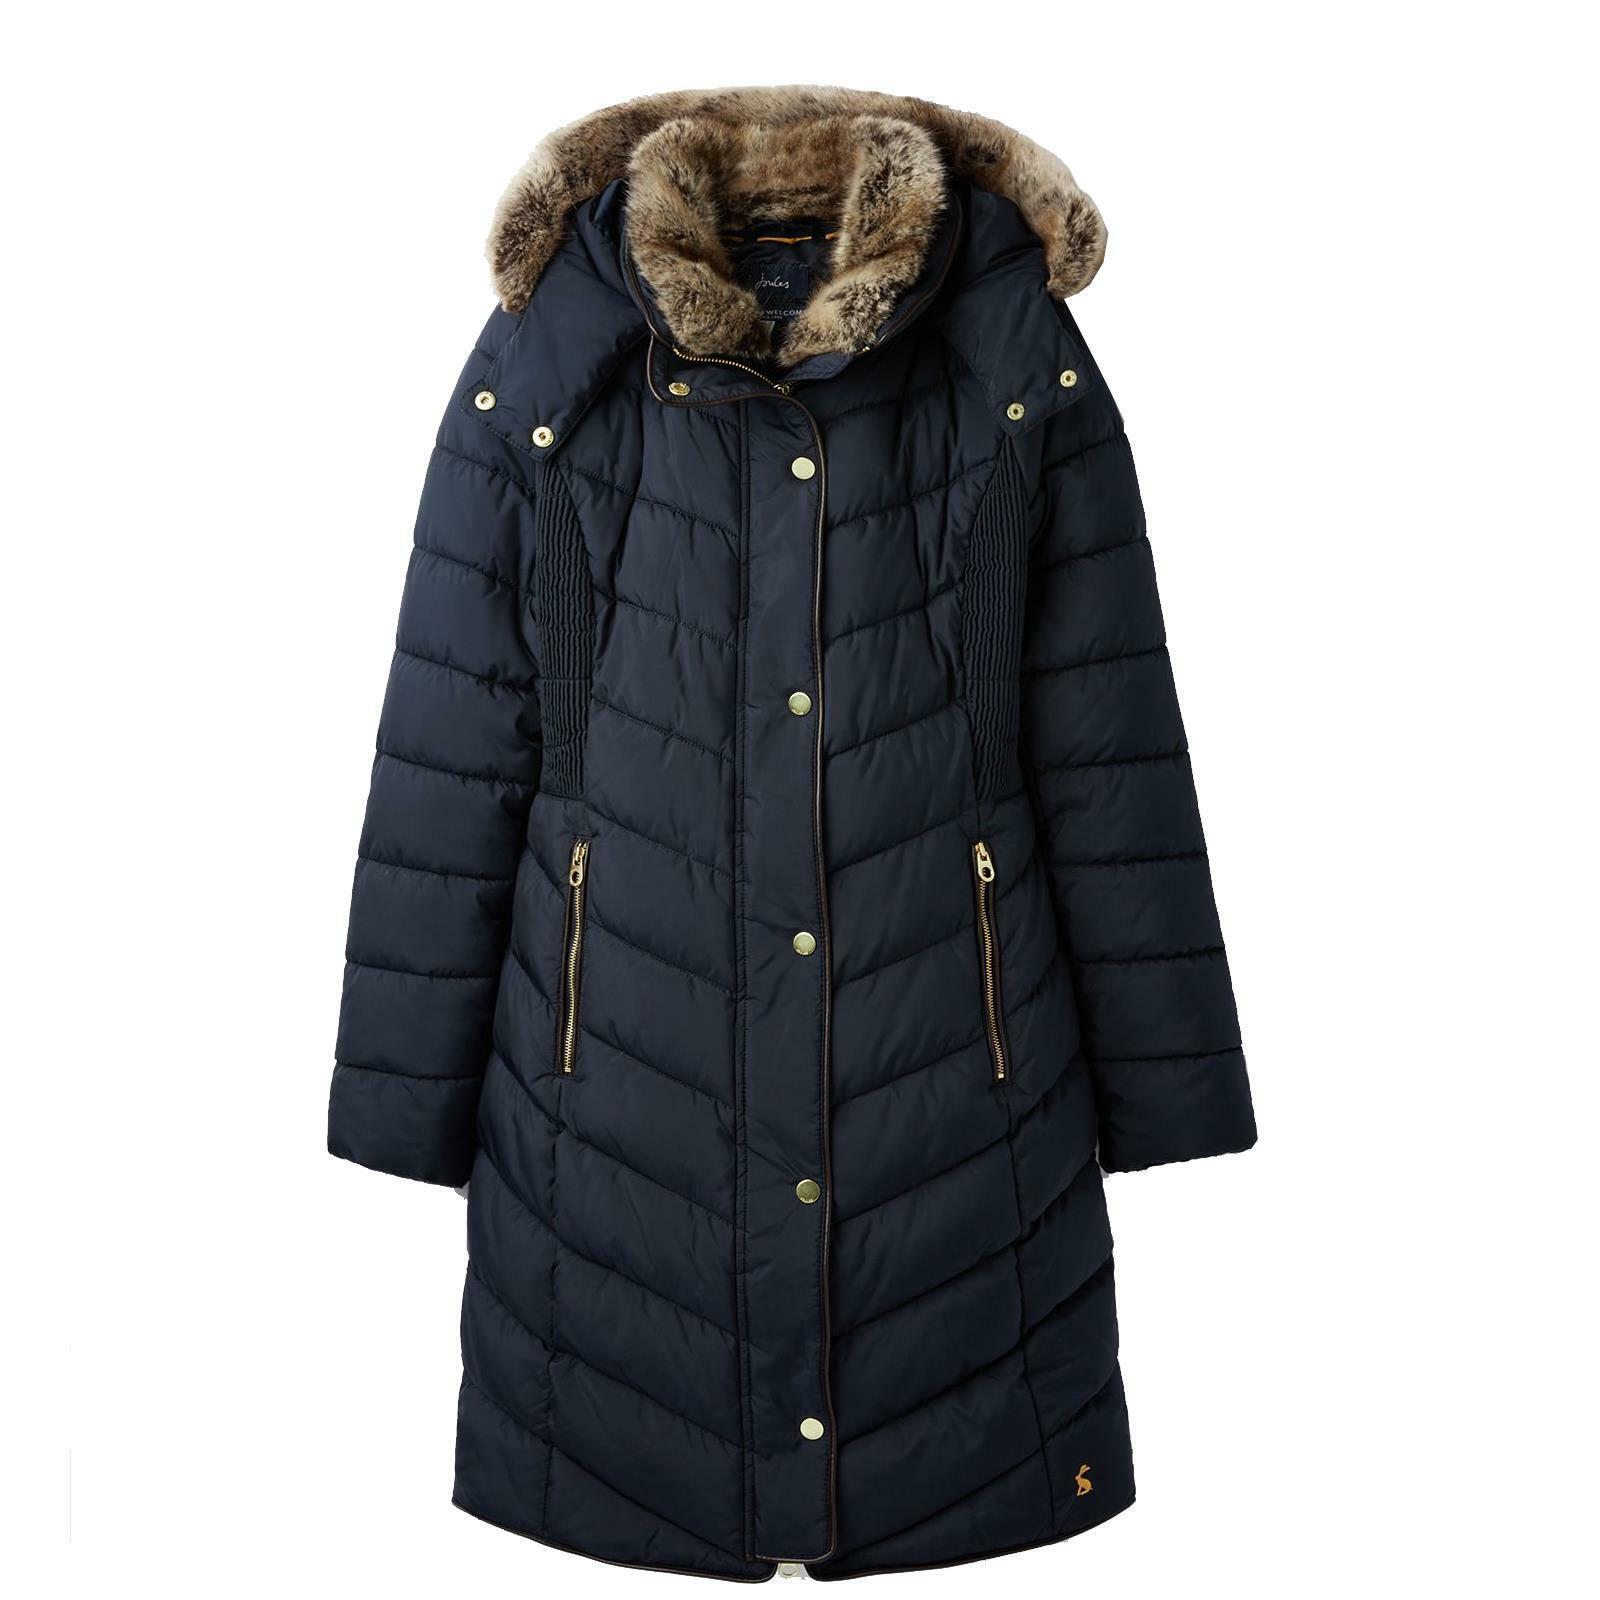 Joules CheRington Paded Chevron Quilt Longline Coat Buitenshuis Snow Fur Trim Hood